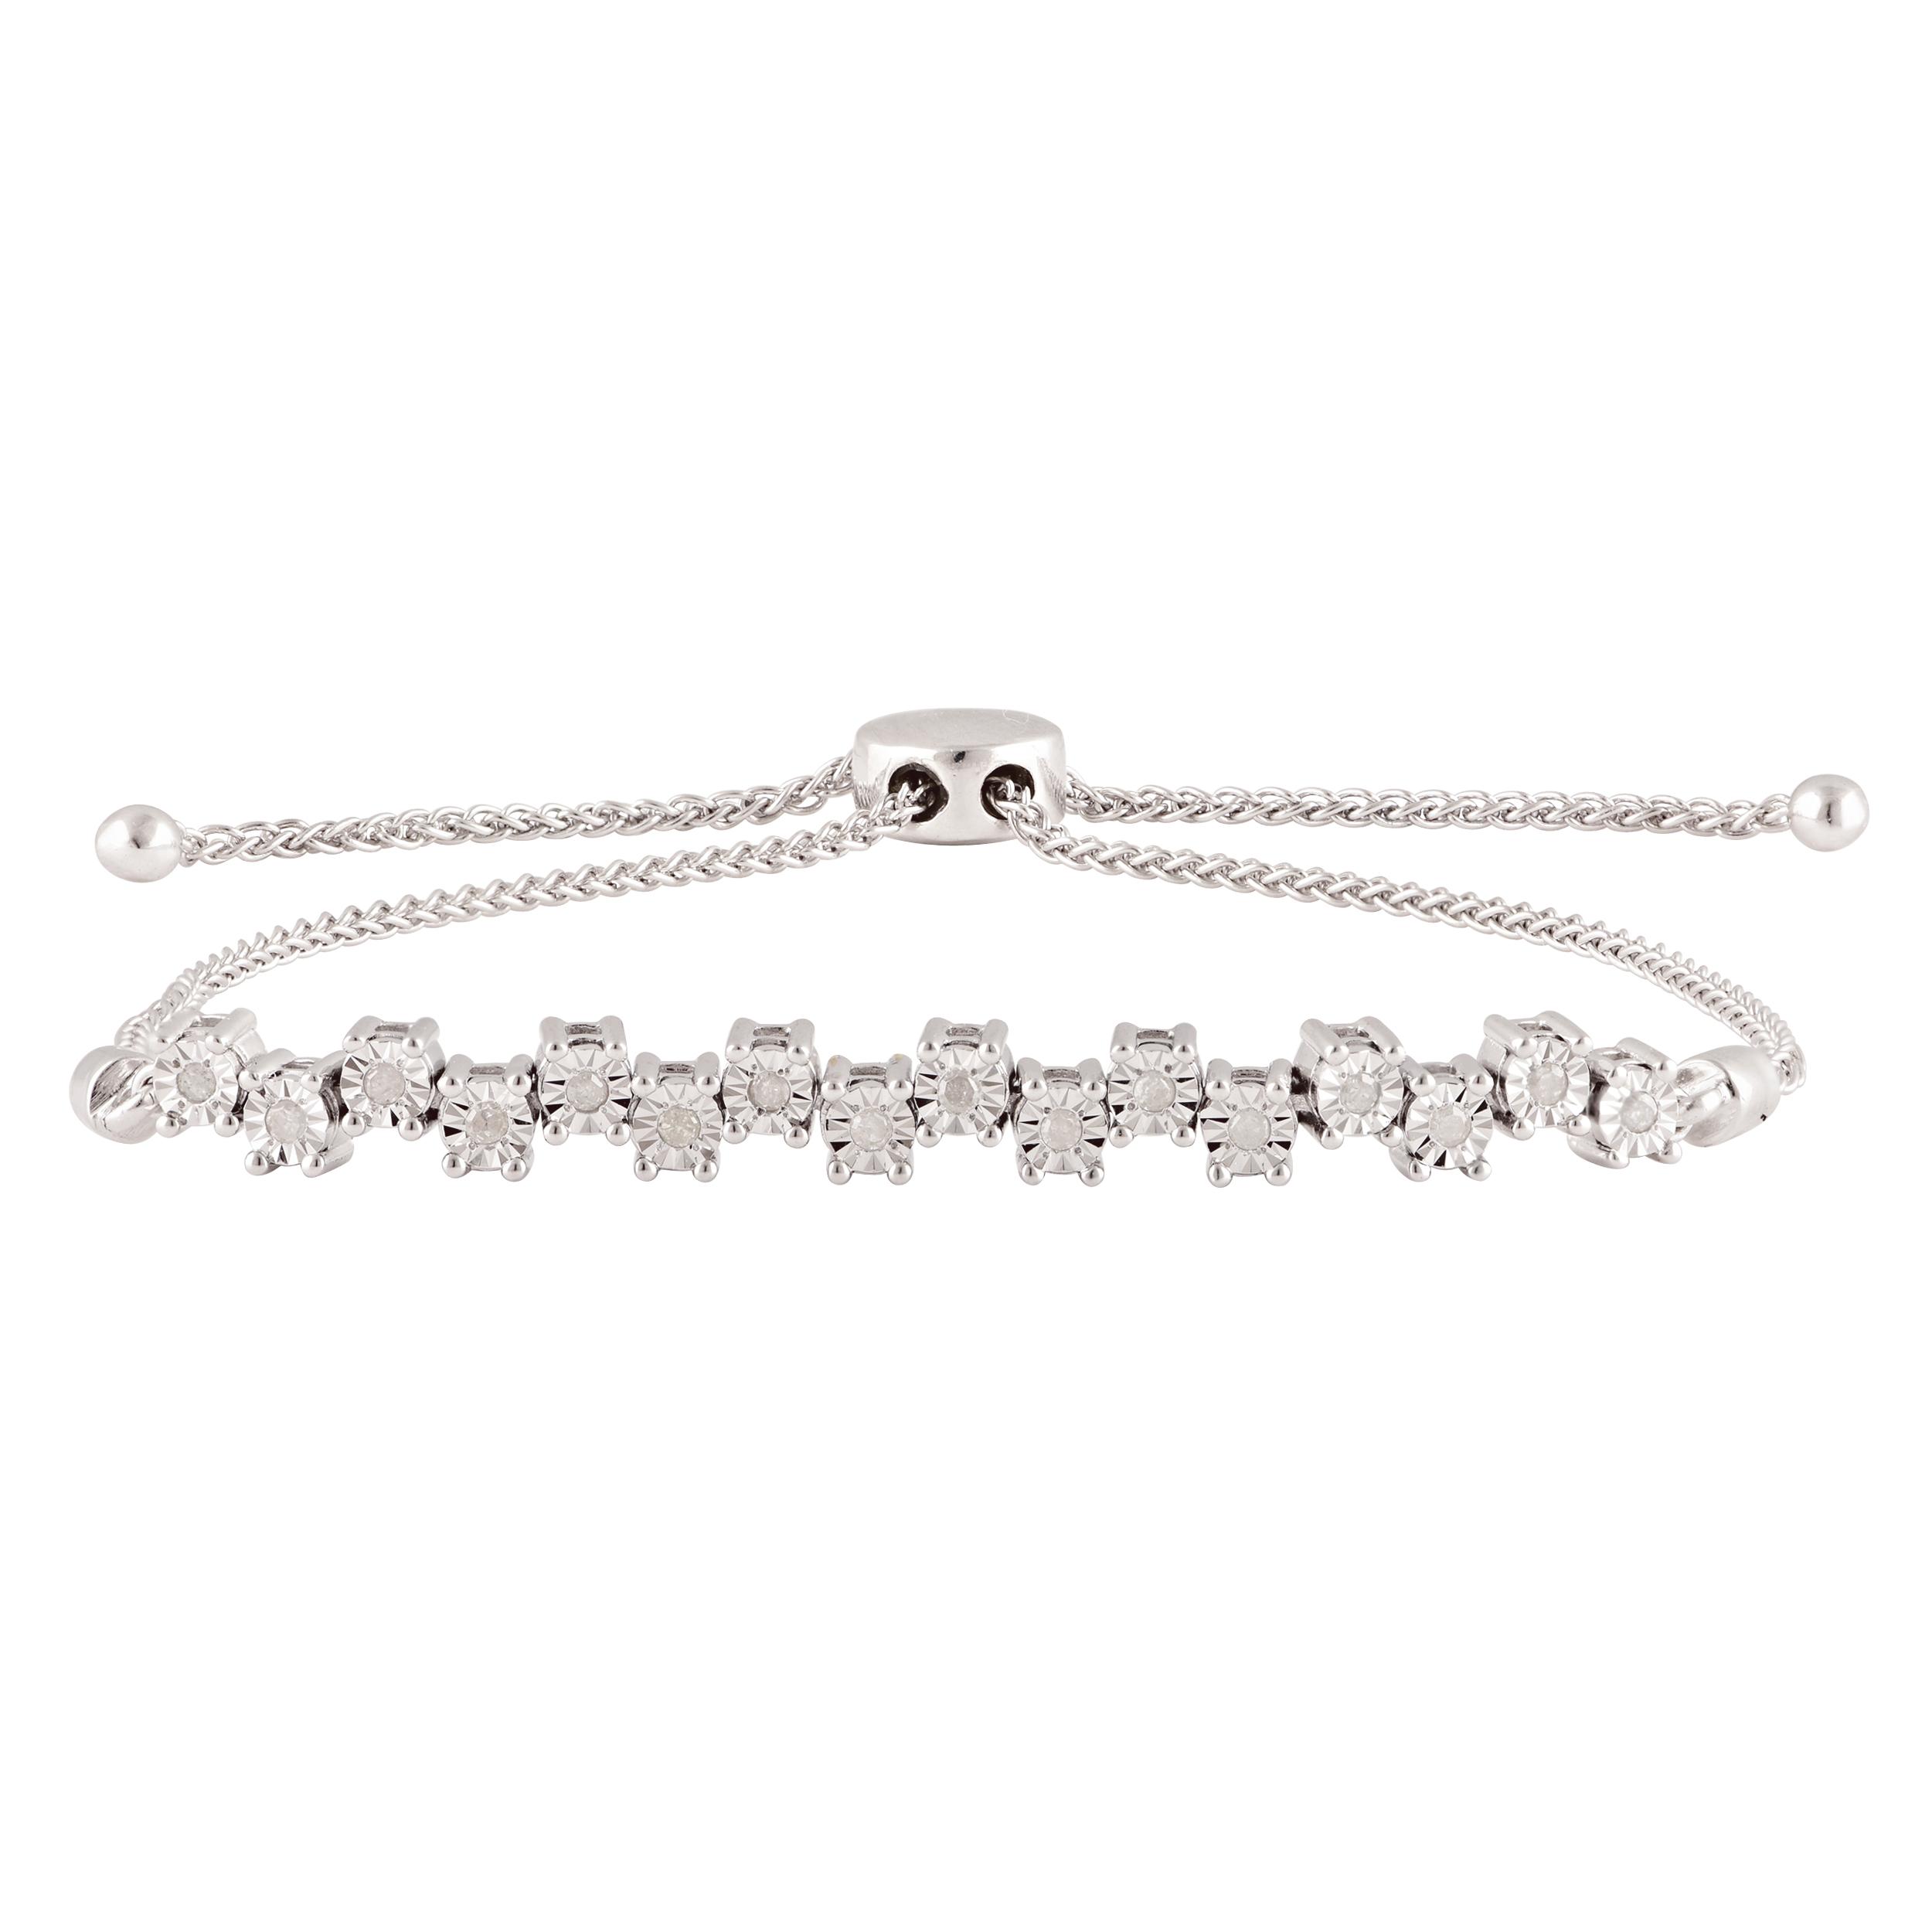 Sterling Silver 15 Points Diamond Bracelet with 16 Brilliant Cut Diamonds